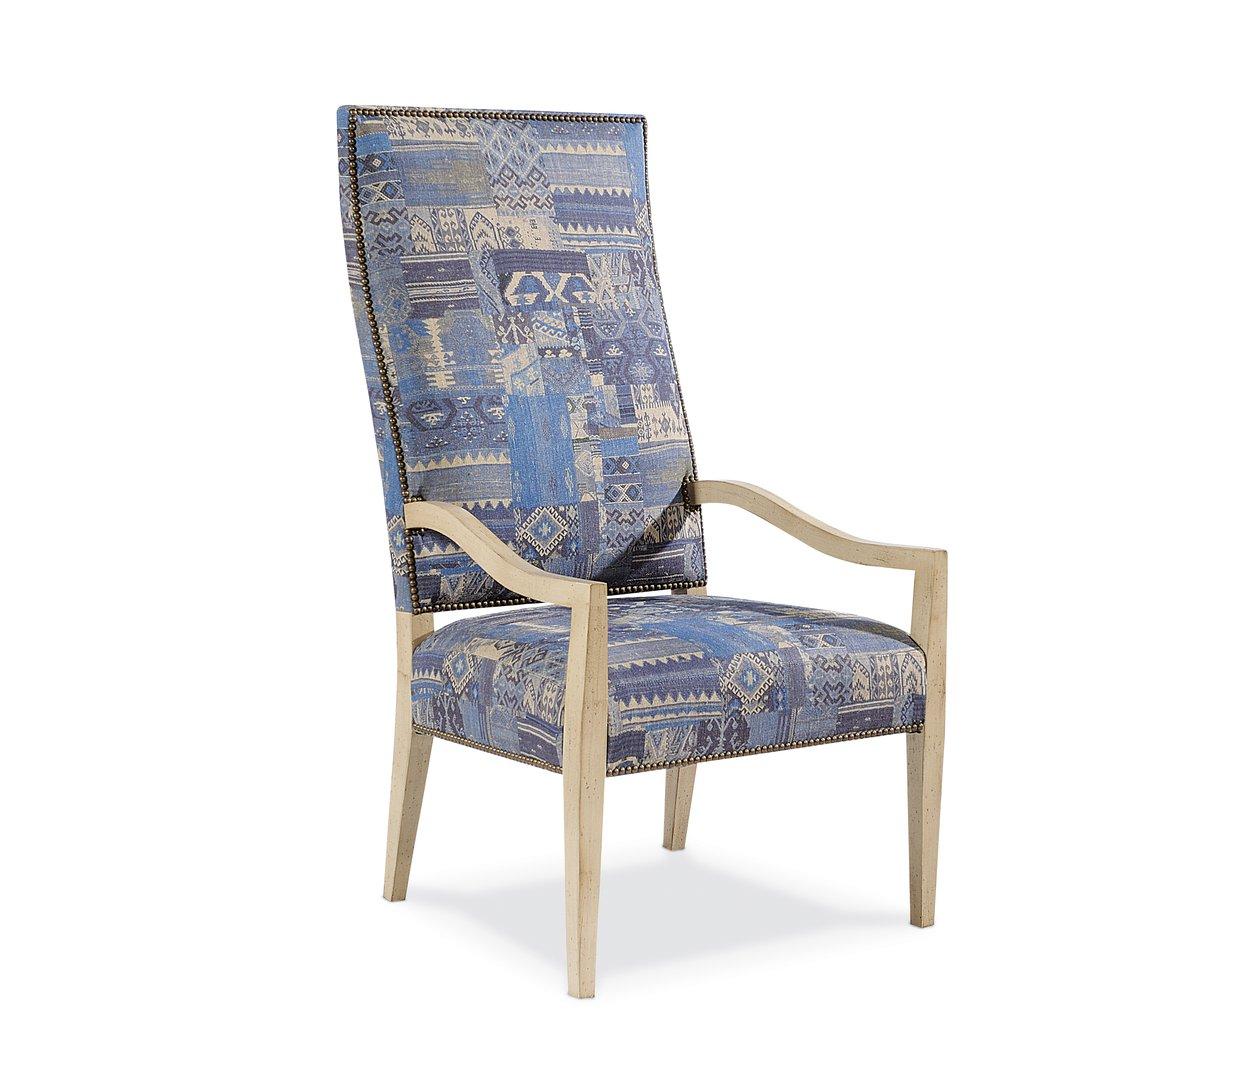 James Chair Image